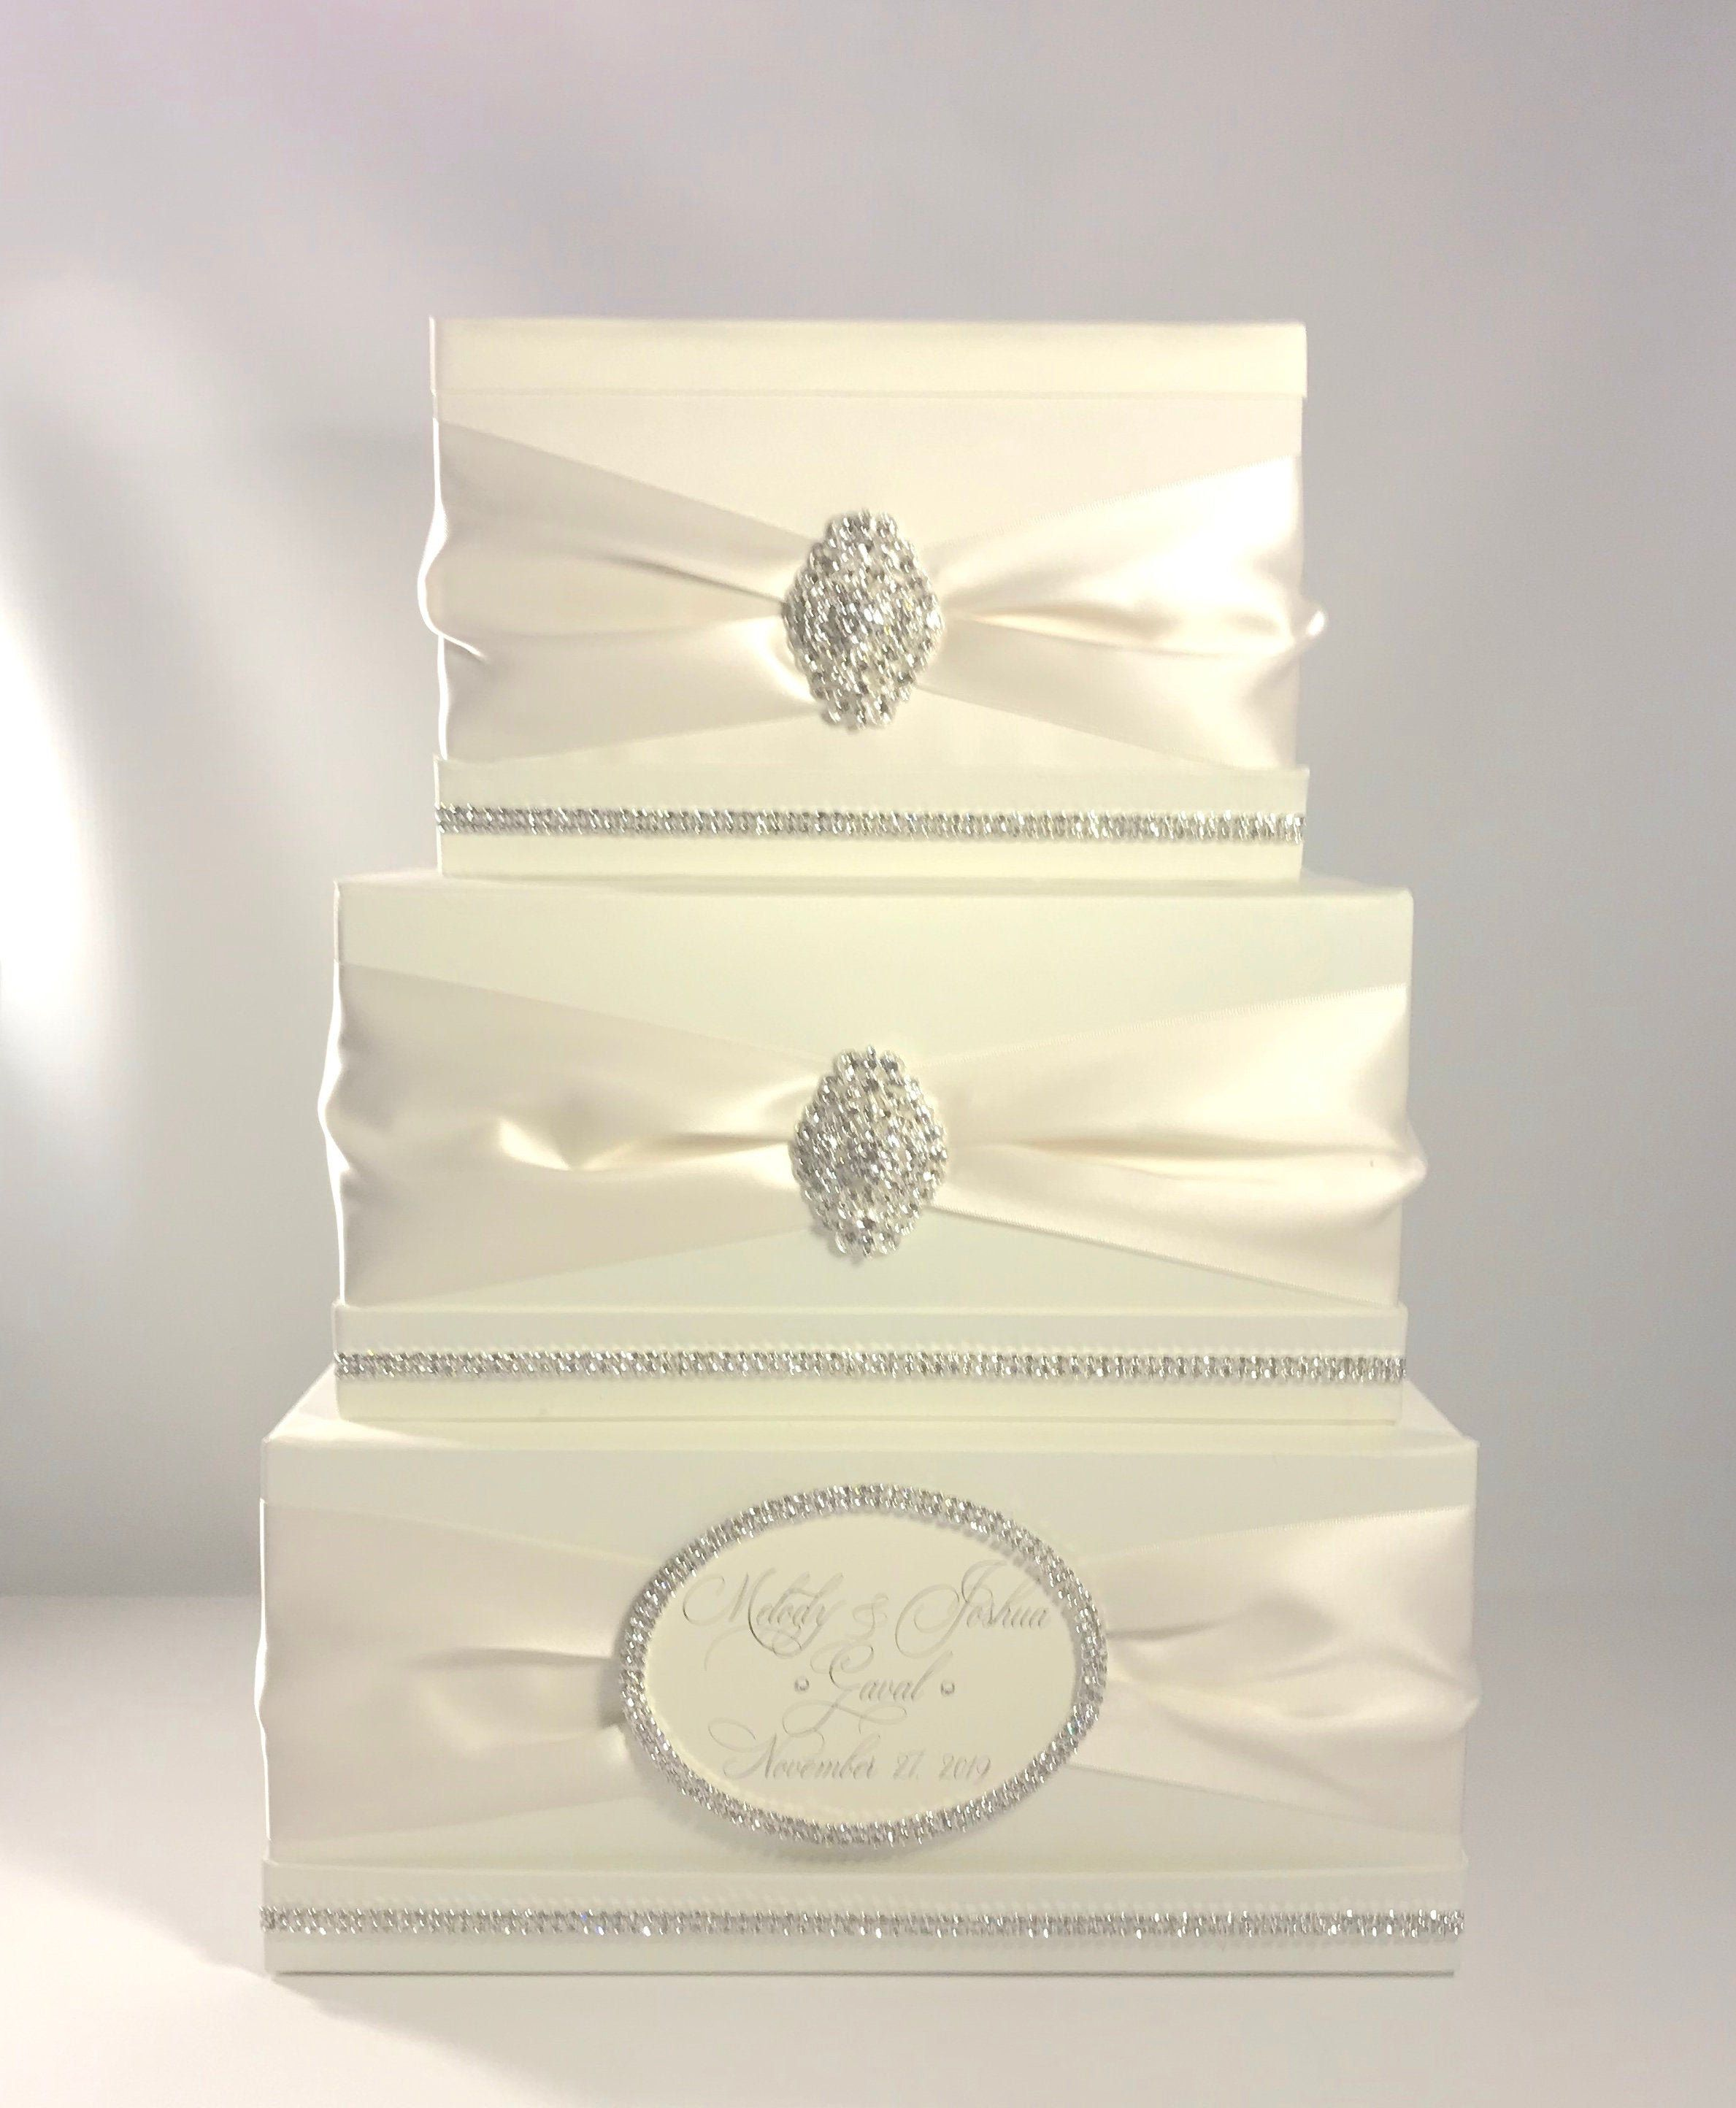 Wedding Money Box With Lock Ivory Or White Classic Etsy In 2020 Money Box Wedding Personalized Wedding Card Holder Card Box Wedding